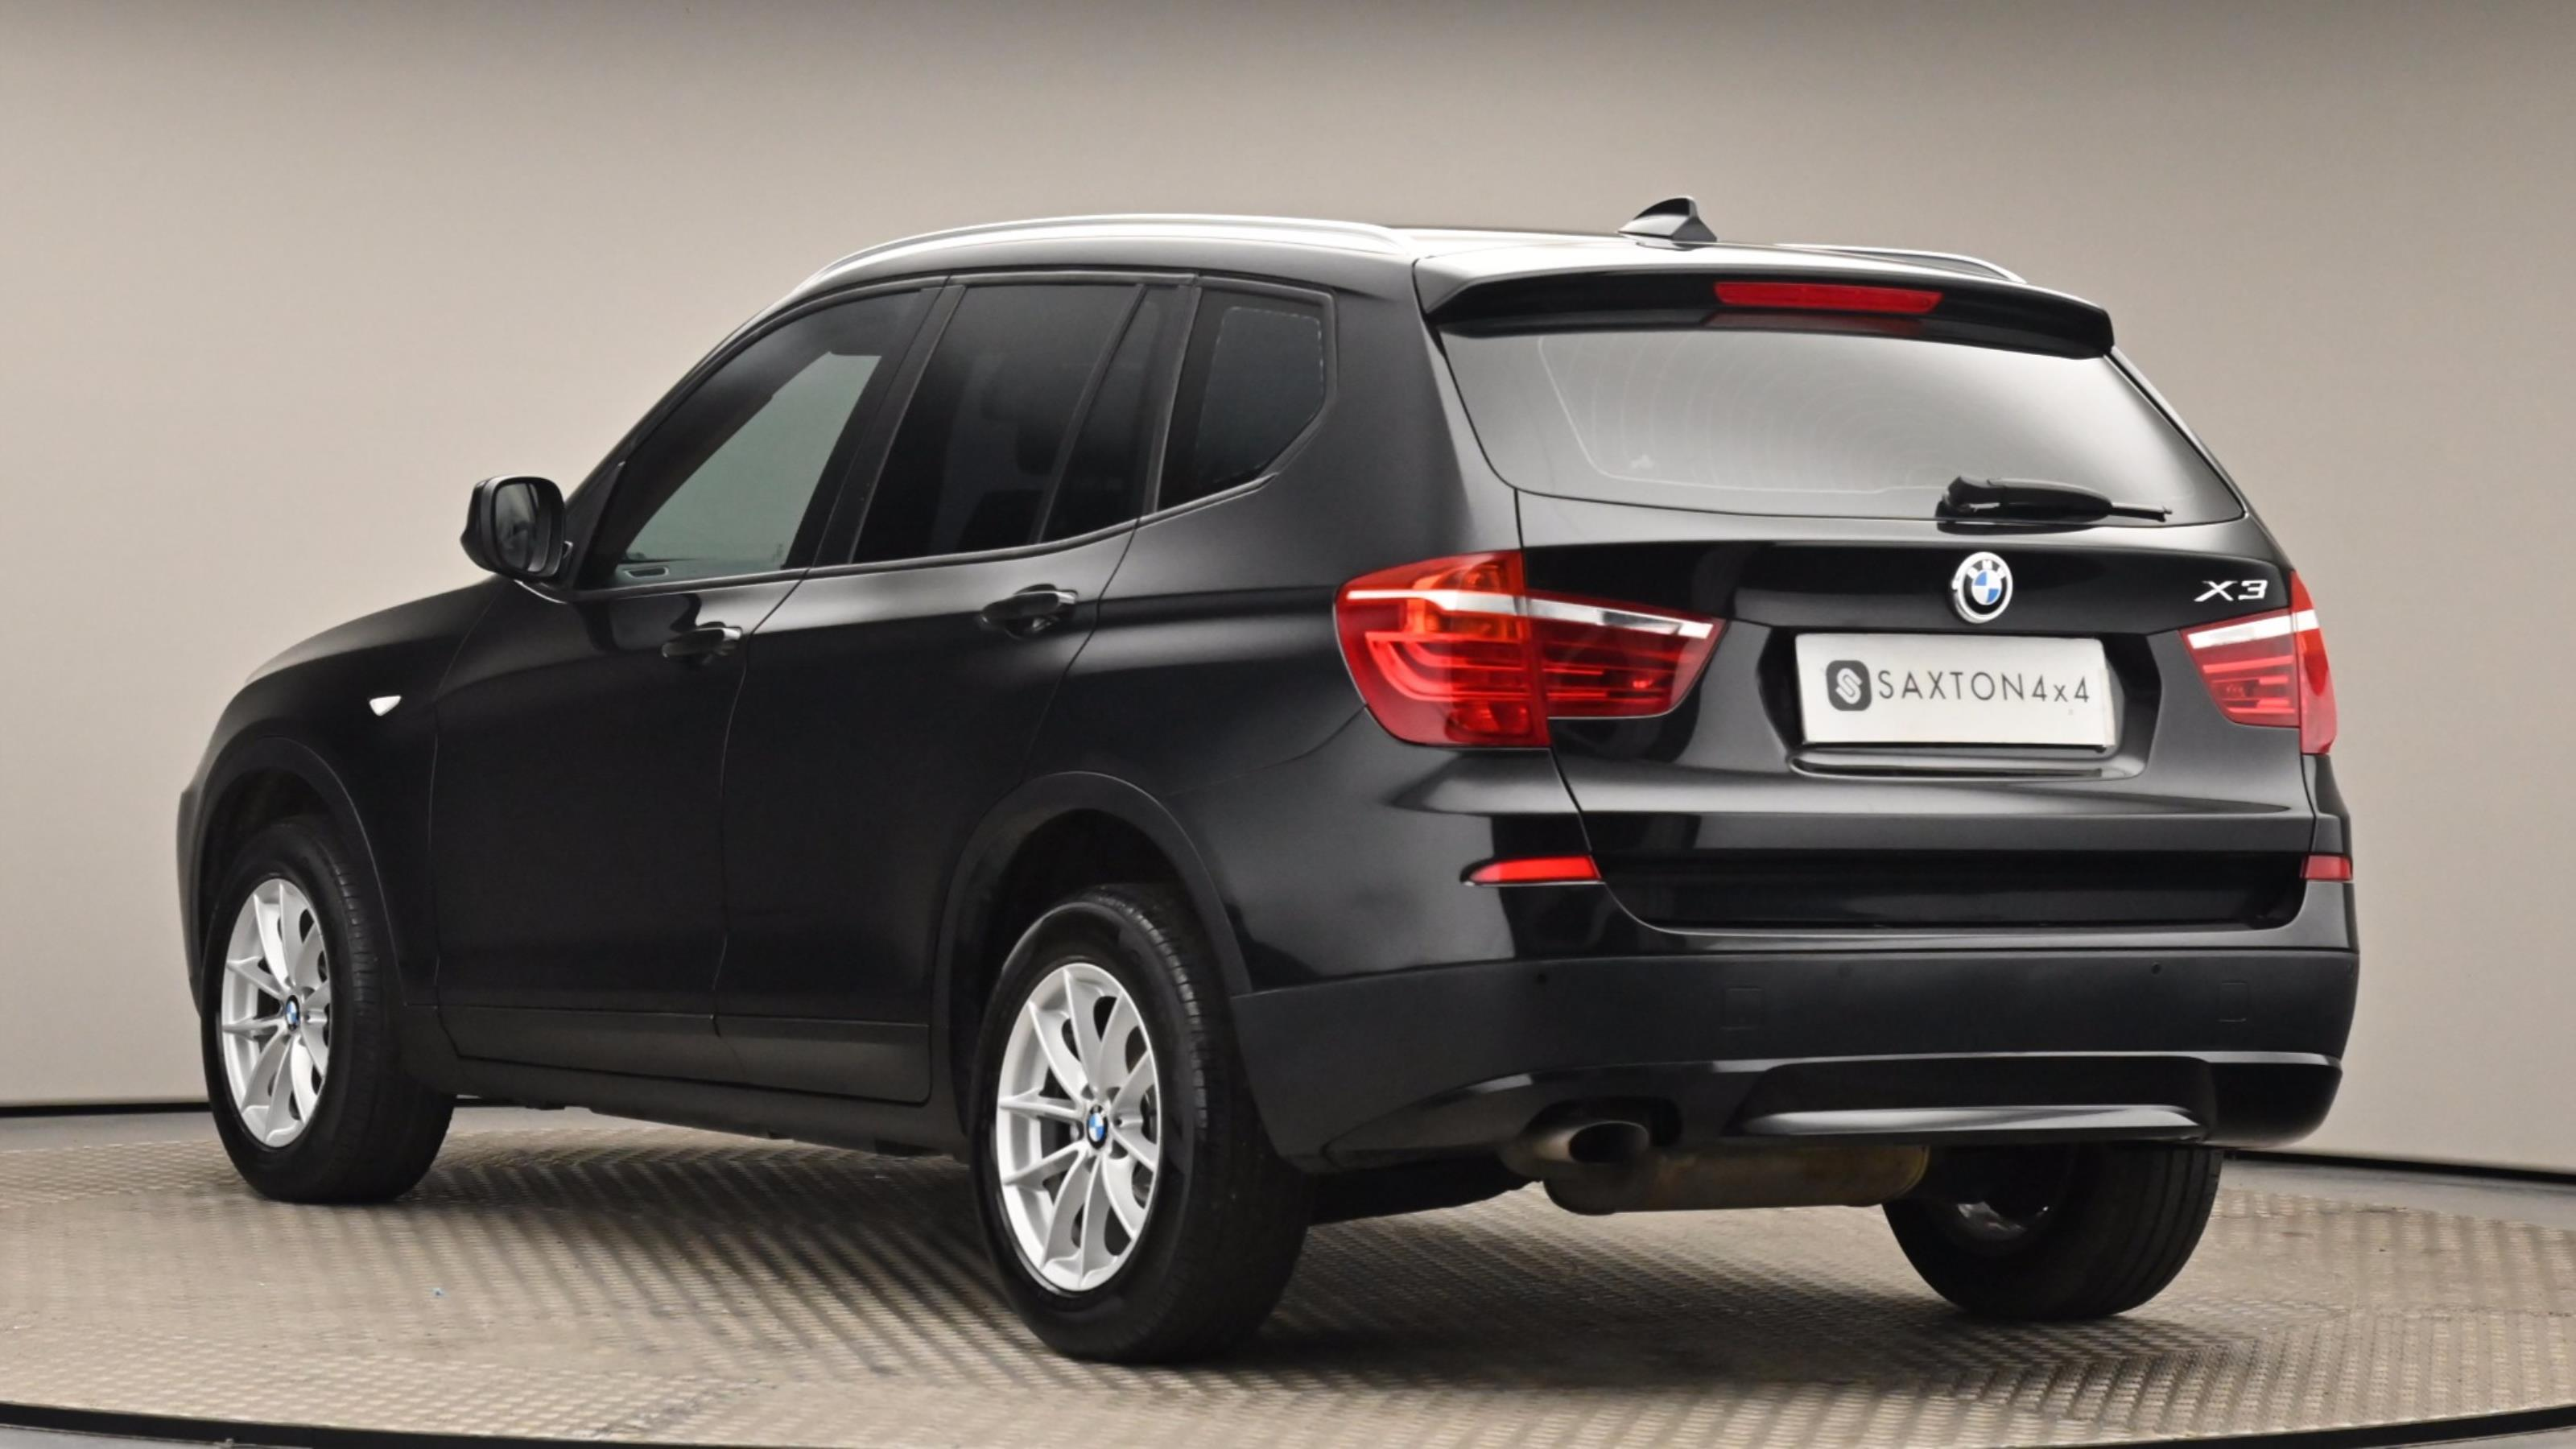 Used 12 BMW X3 xDrive20d SE 5dr Step Auto [Business Media] BLACK at Saxton4x4